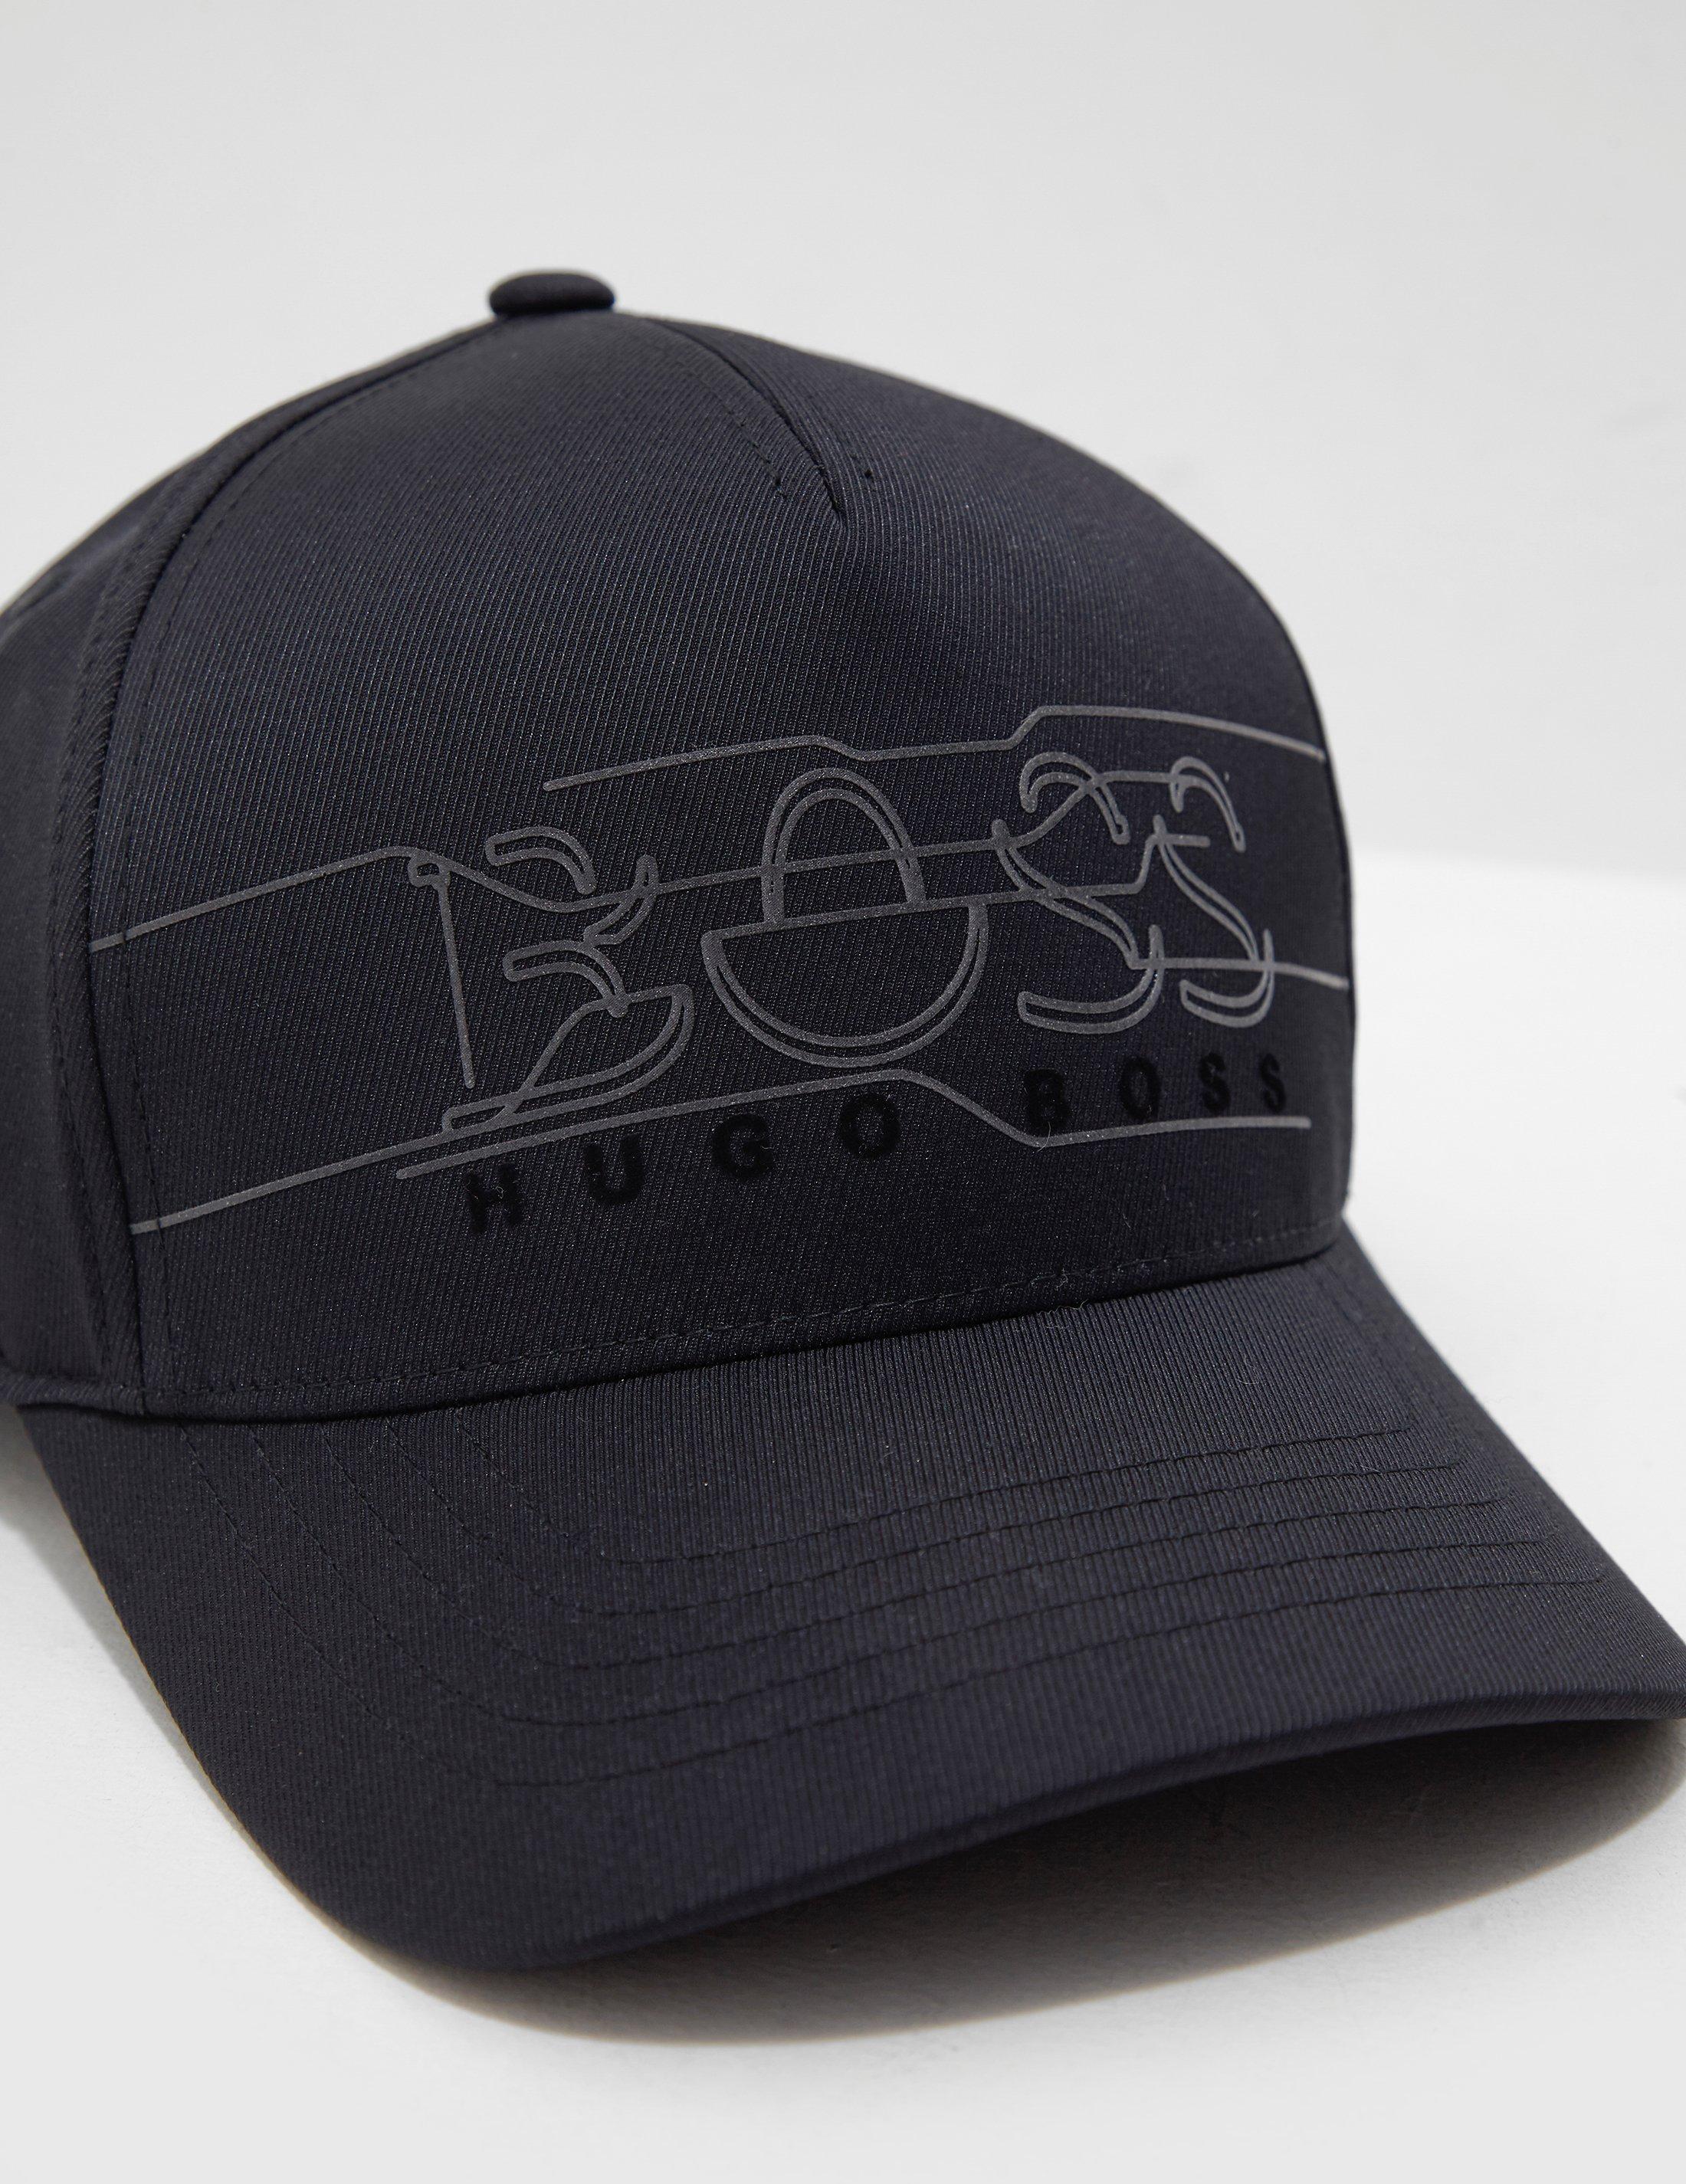 19405cc6e1e201 BOSS Reflective Logo Cap - Online Exclusive Black in Black for Men - Lyst